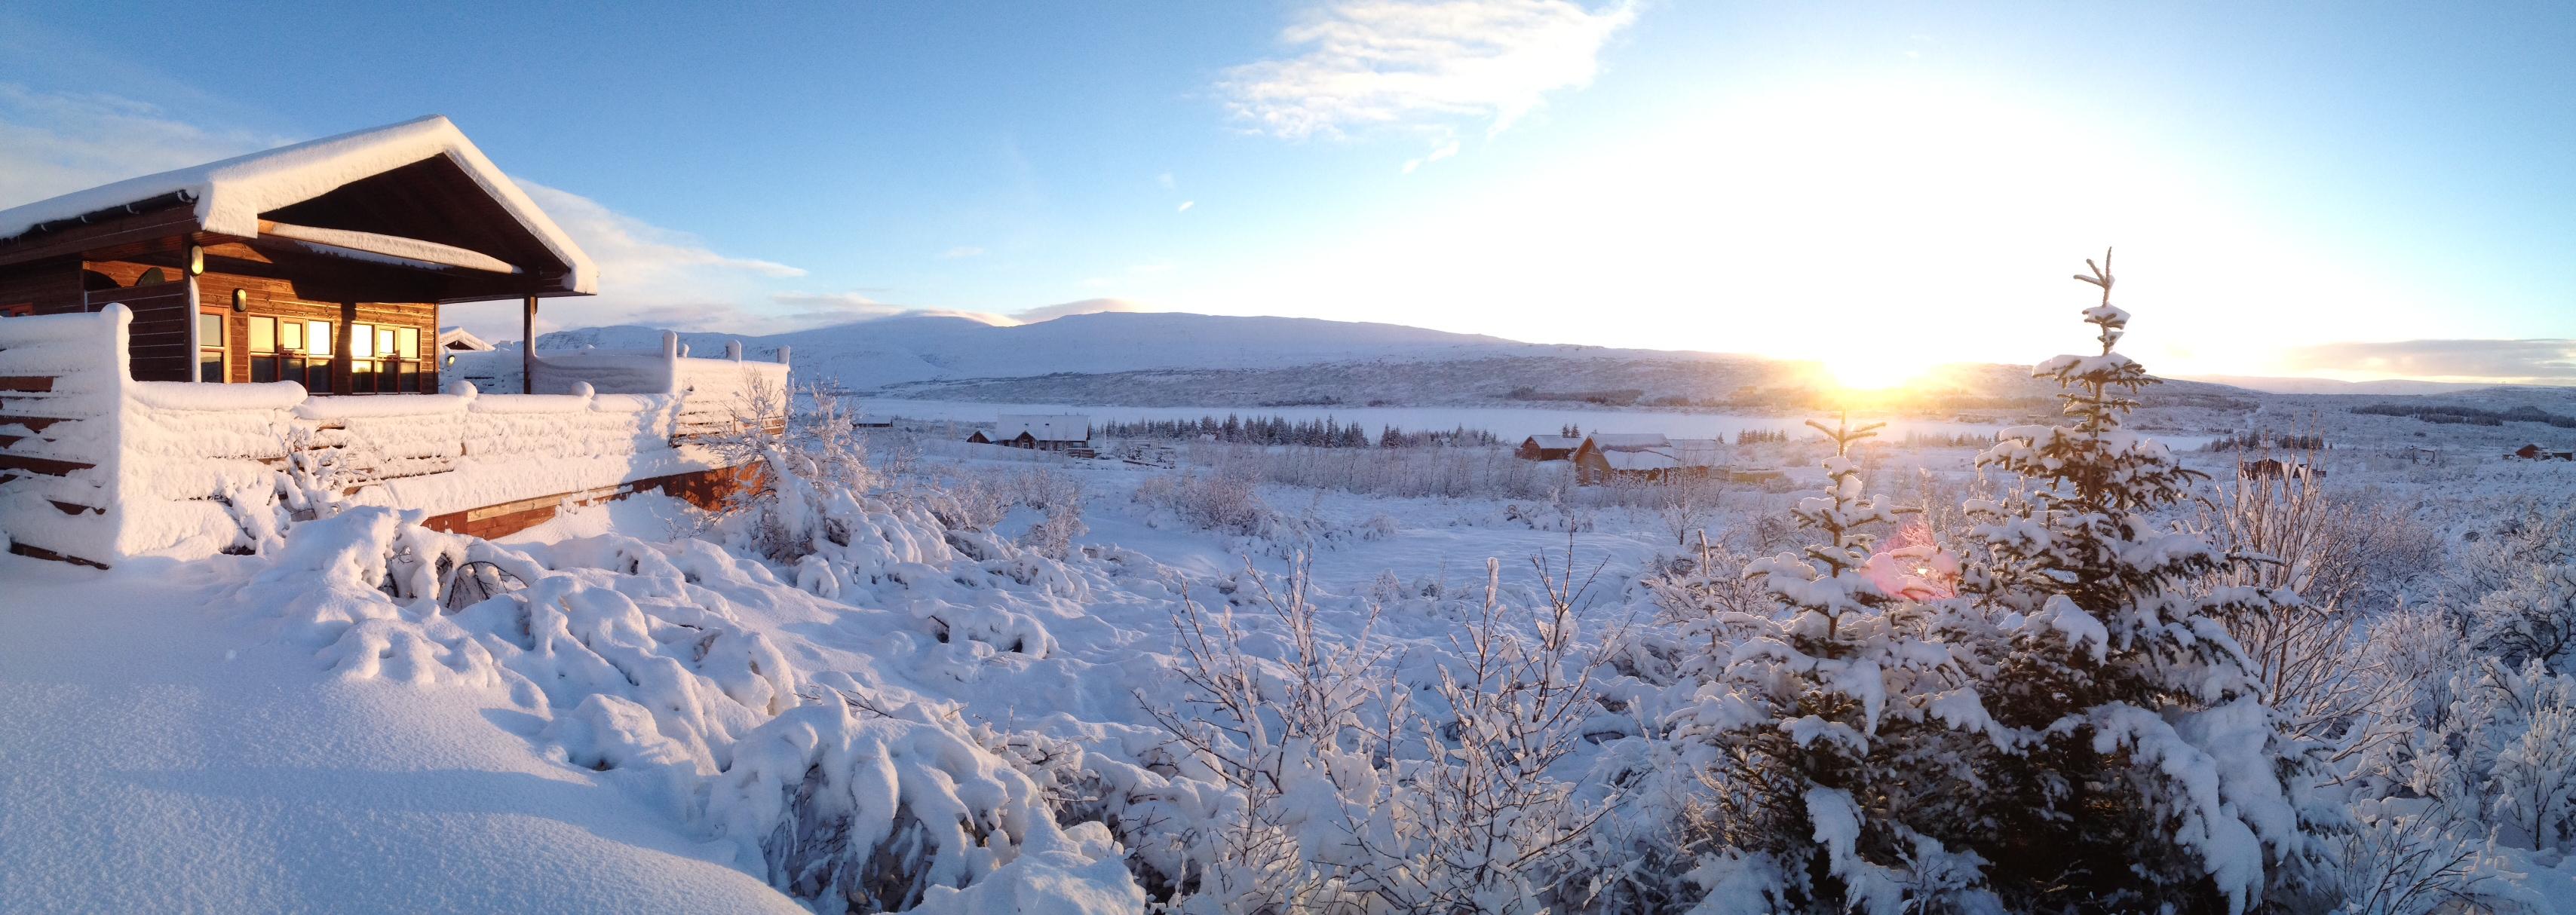 Uppsalir Ferienhaus winter